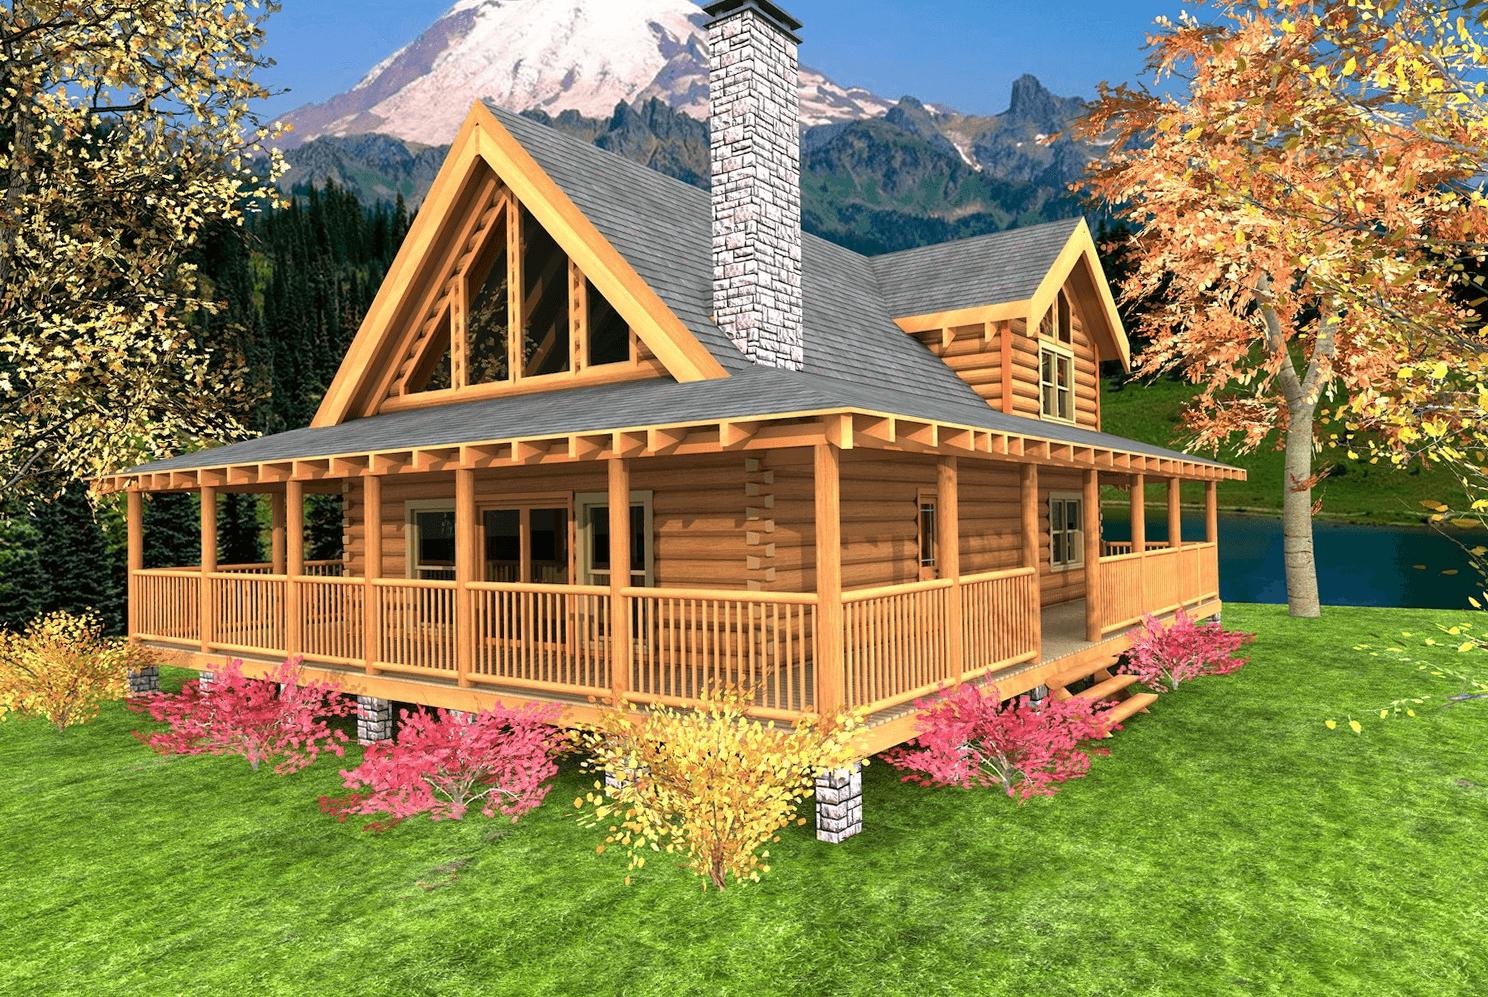 Amazing Small House Front Porch Design Ideas For All House Types Small House Tips Rustic House Plans Porch House Plans Log Cabin Plans